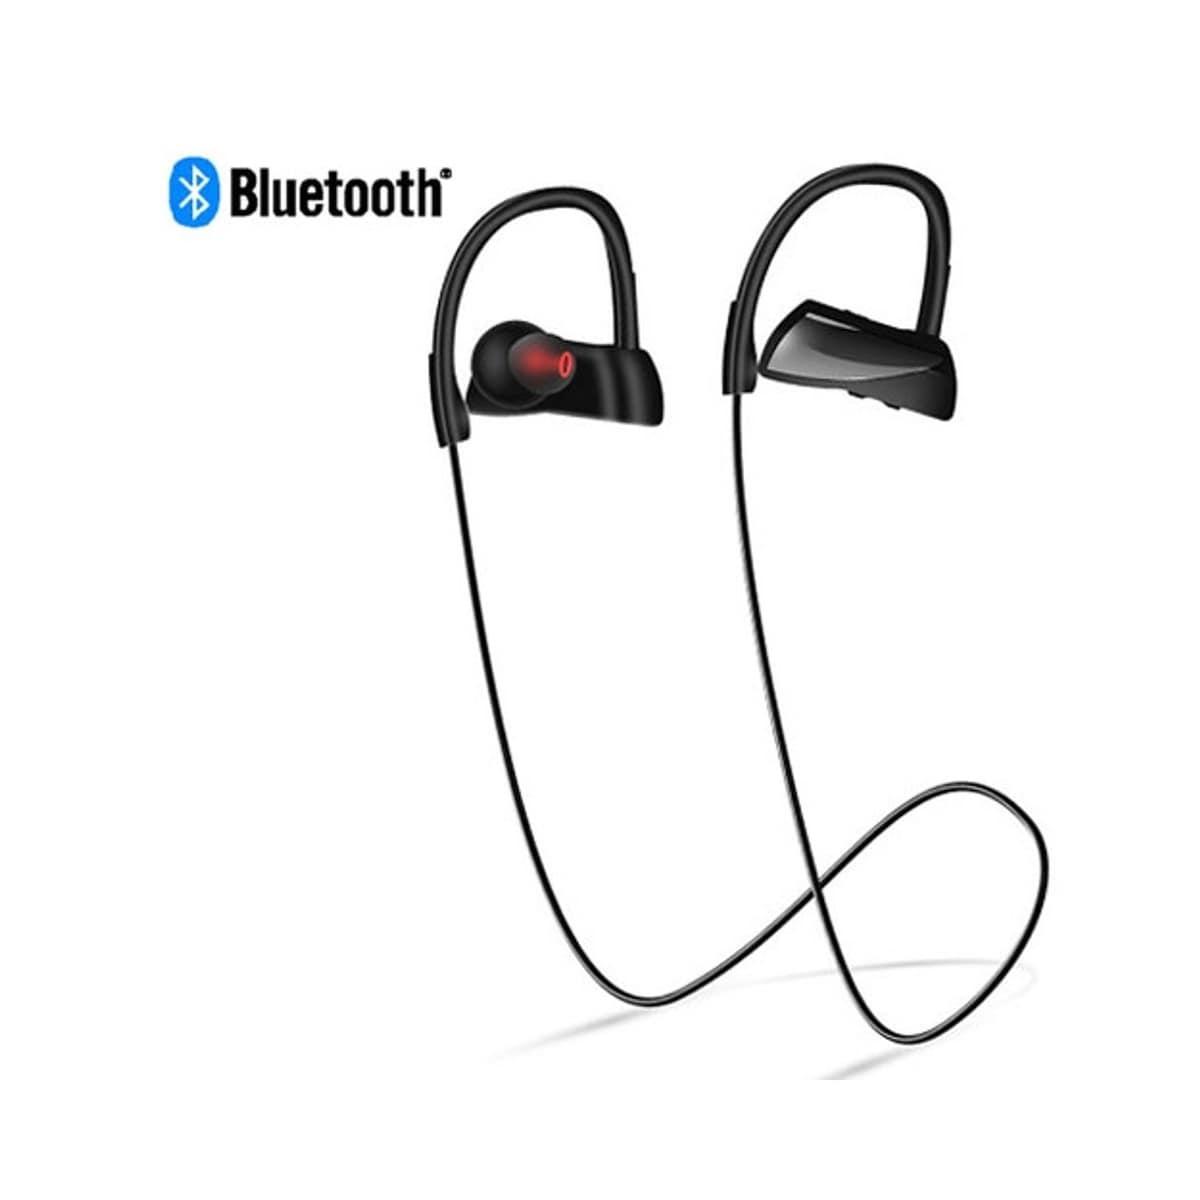 Shop Insten Ipx7 Waterproof Wireless Bluetooth Headset Stereo Handsfree Headphone For Sports Apple Iphone Xs Max Xr Cellphones Overstock 26433874